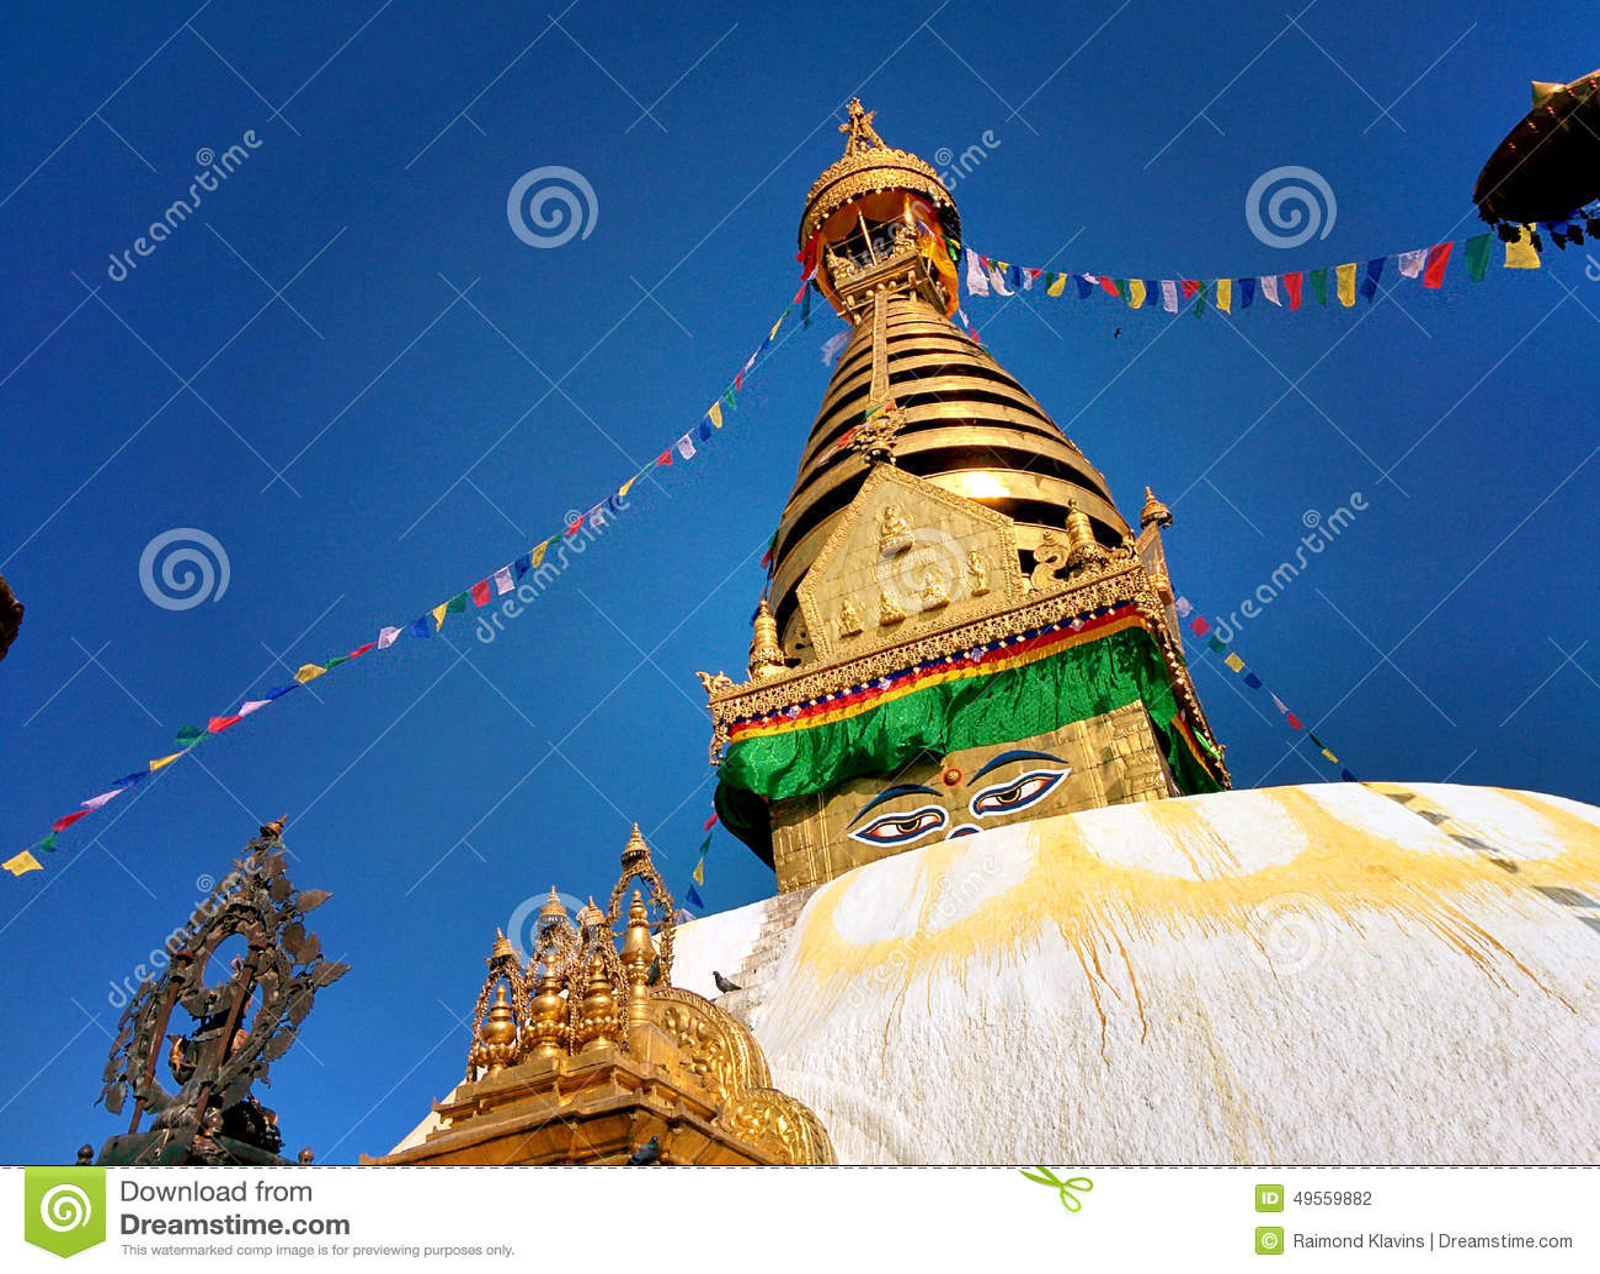 Stupa Swayambhunath with eyes and blue sky